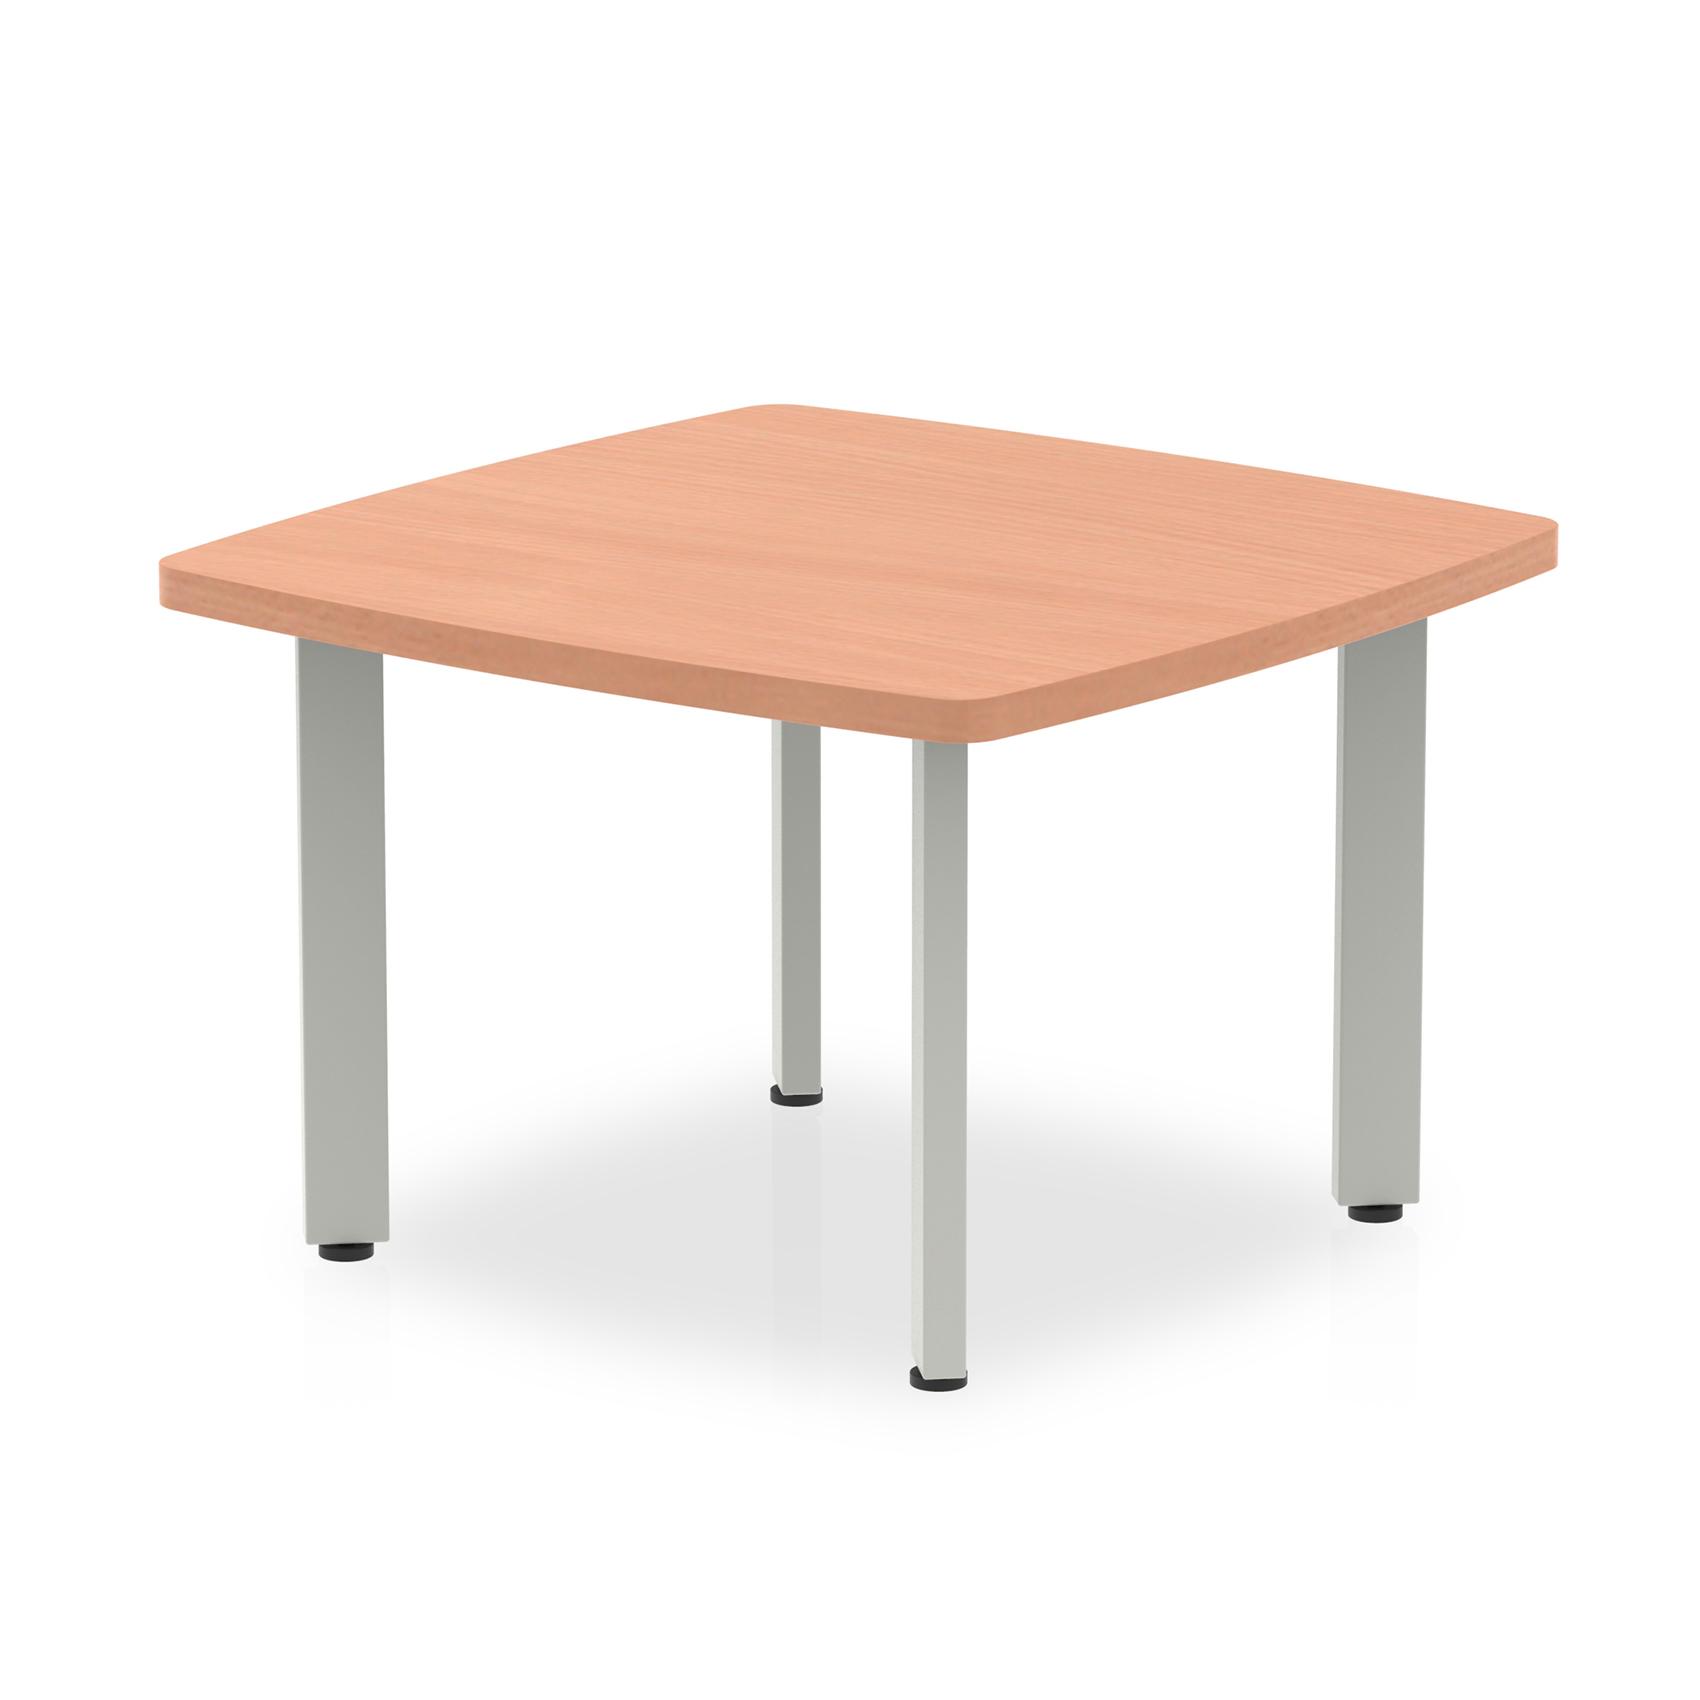 Trexus Coffee Table 600x600x450mm Beech Ref I000081